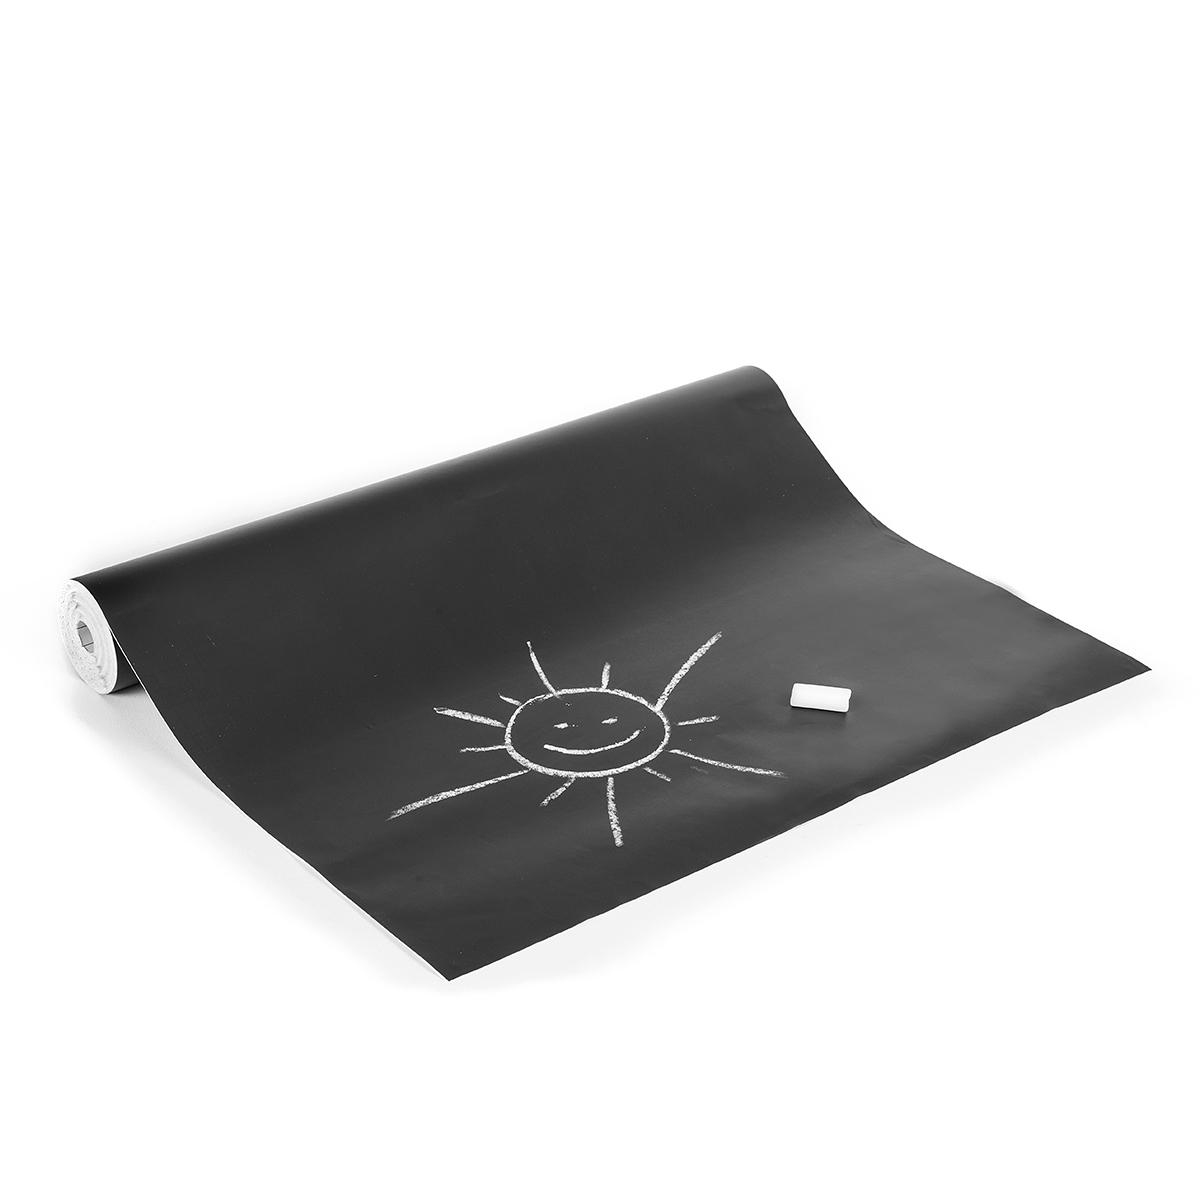 tafelfolie schwarz f r kreide in 45cm breite selbstklebend meterware. Black Bedroom Furniture Sets. Home Design Ideas